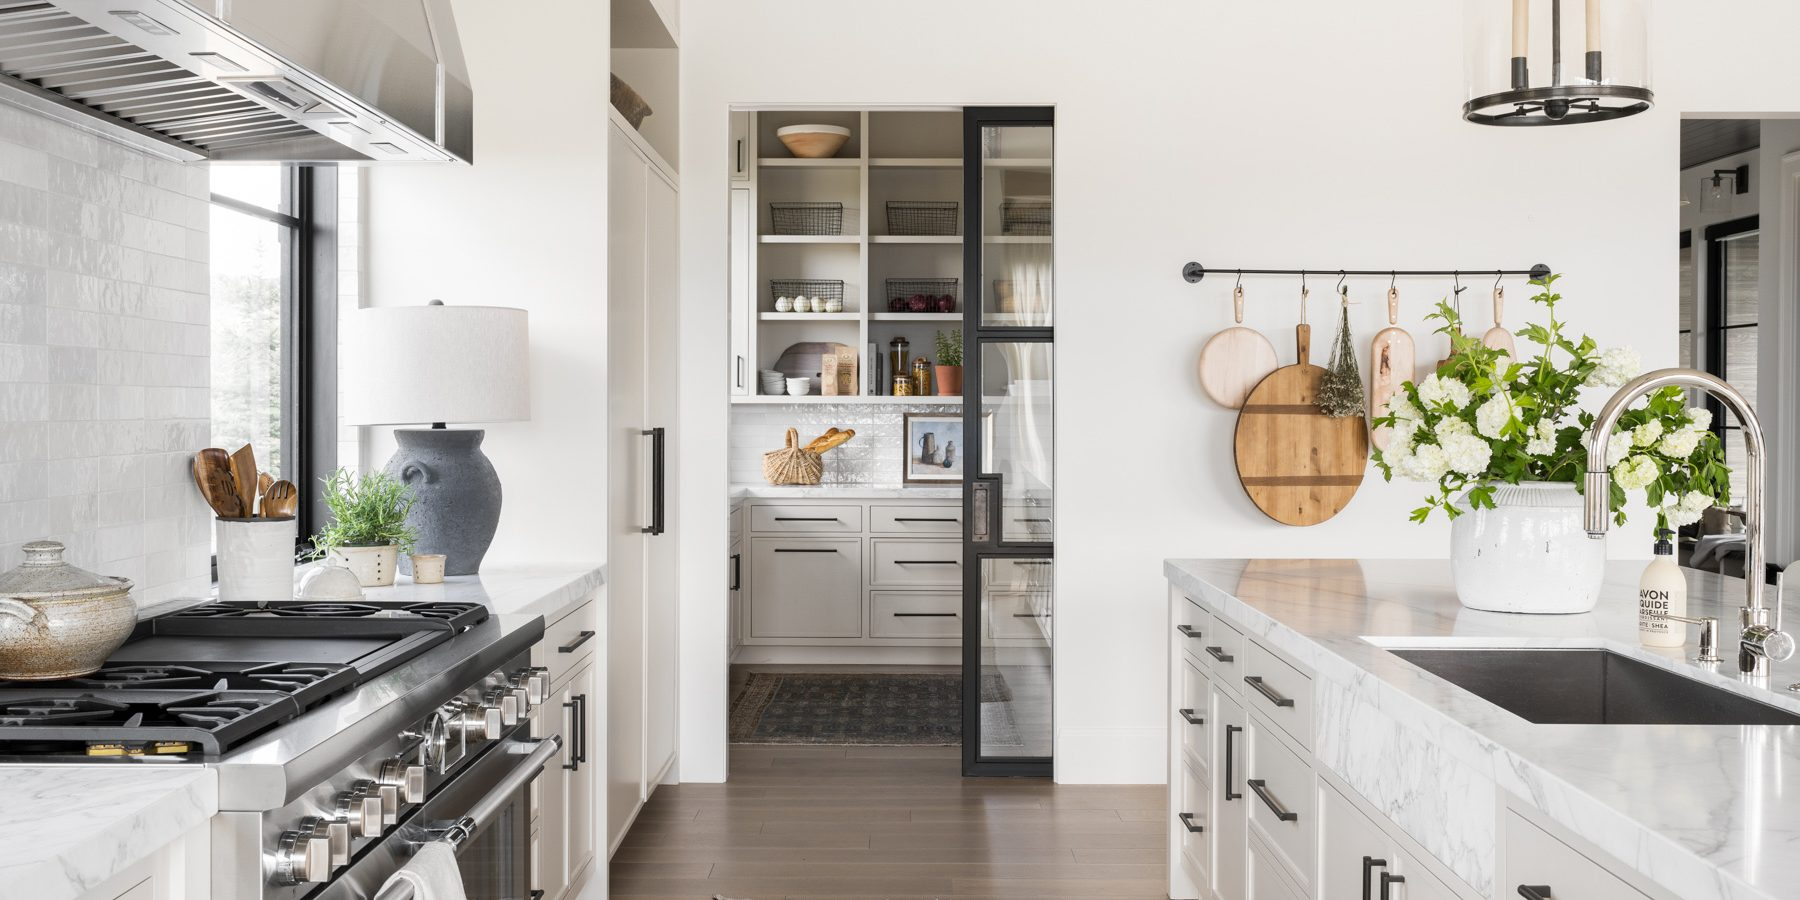 Mountainside Retreat: The Kitchen & Pantry